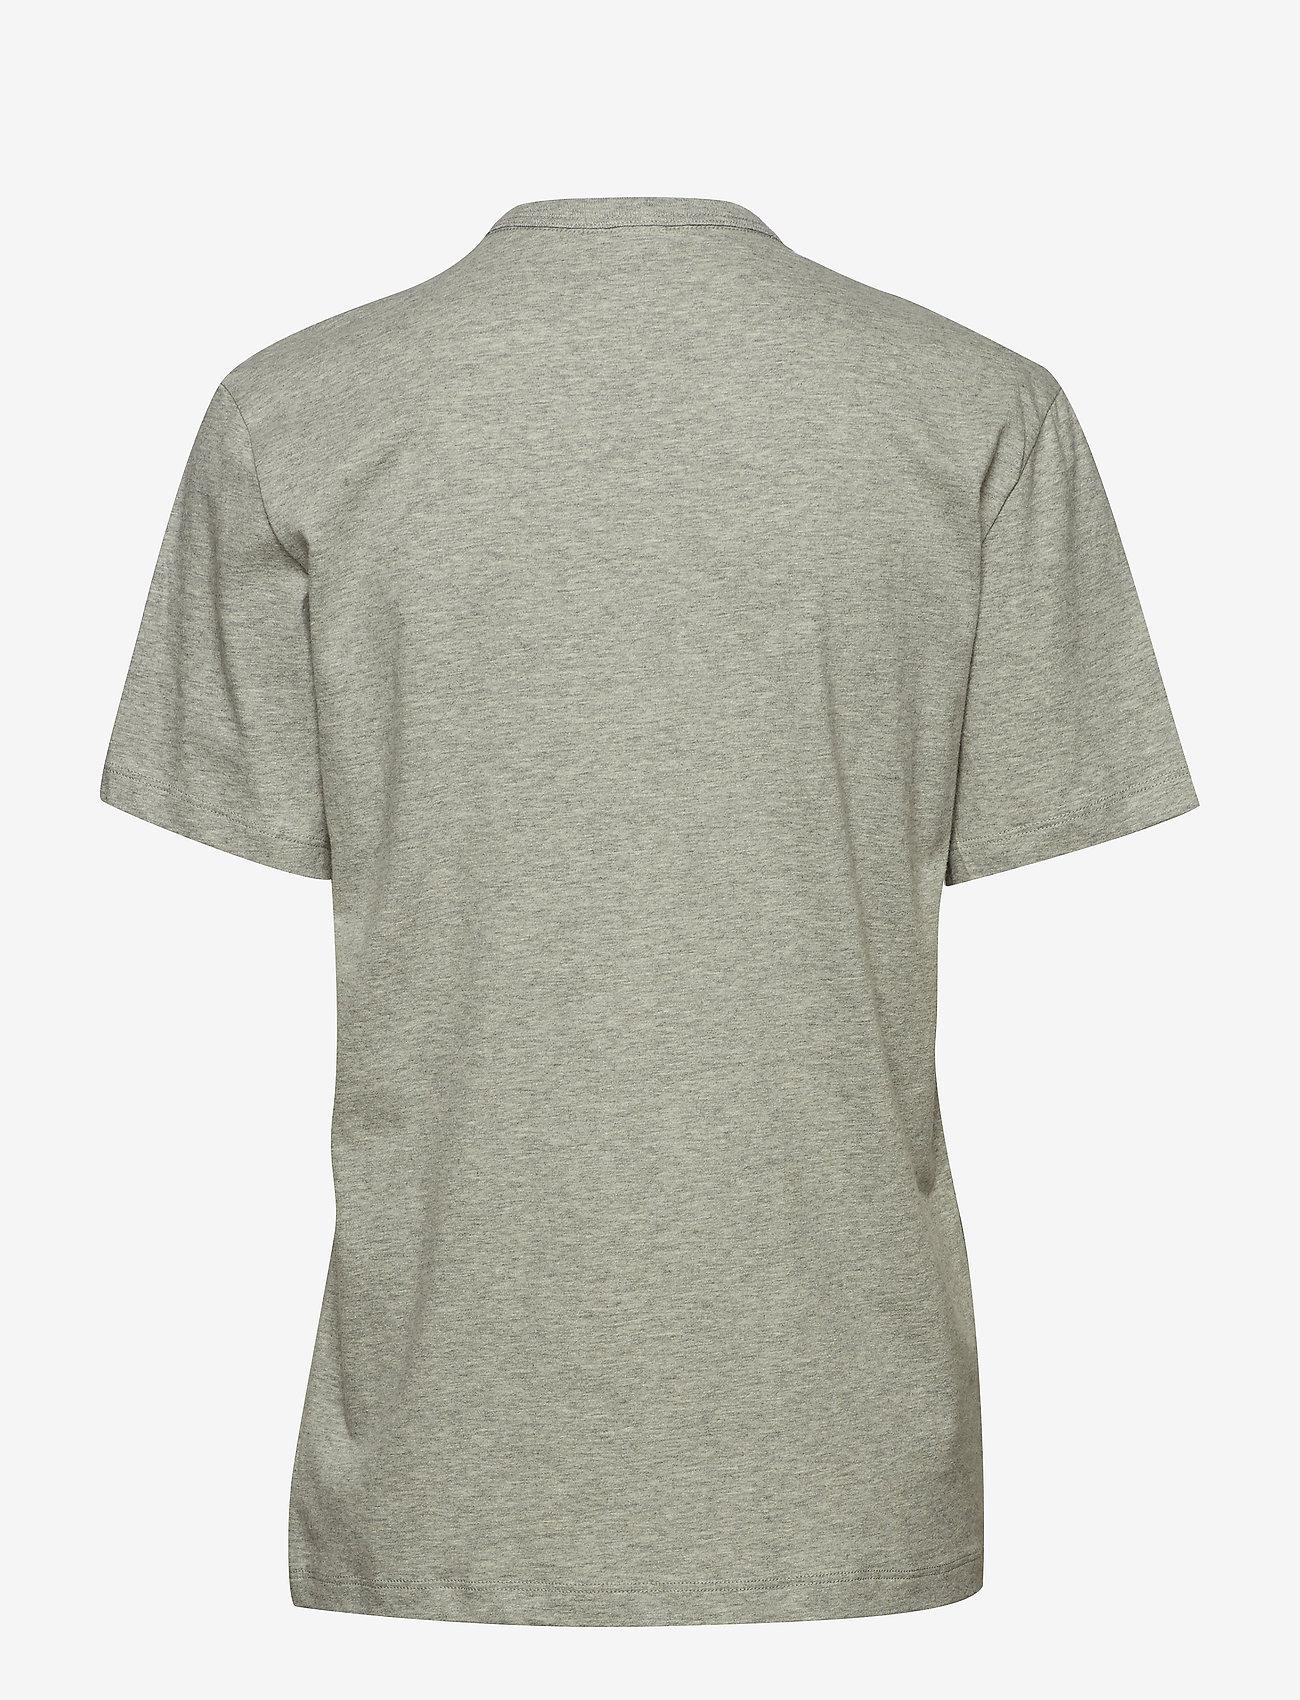 Calvin Klein - S/S CREW NECK - góry - grey heather - 1